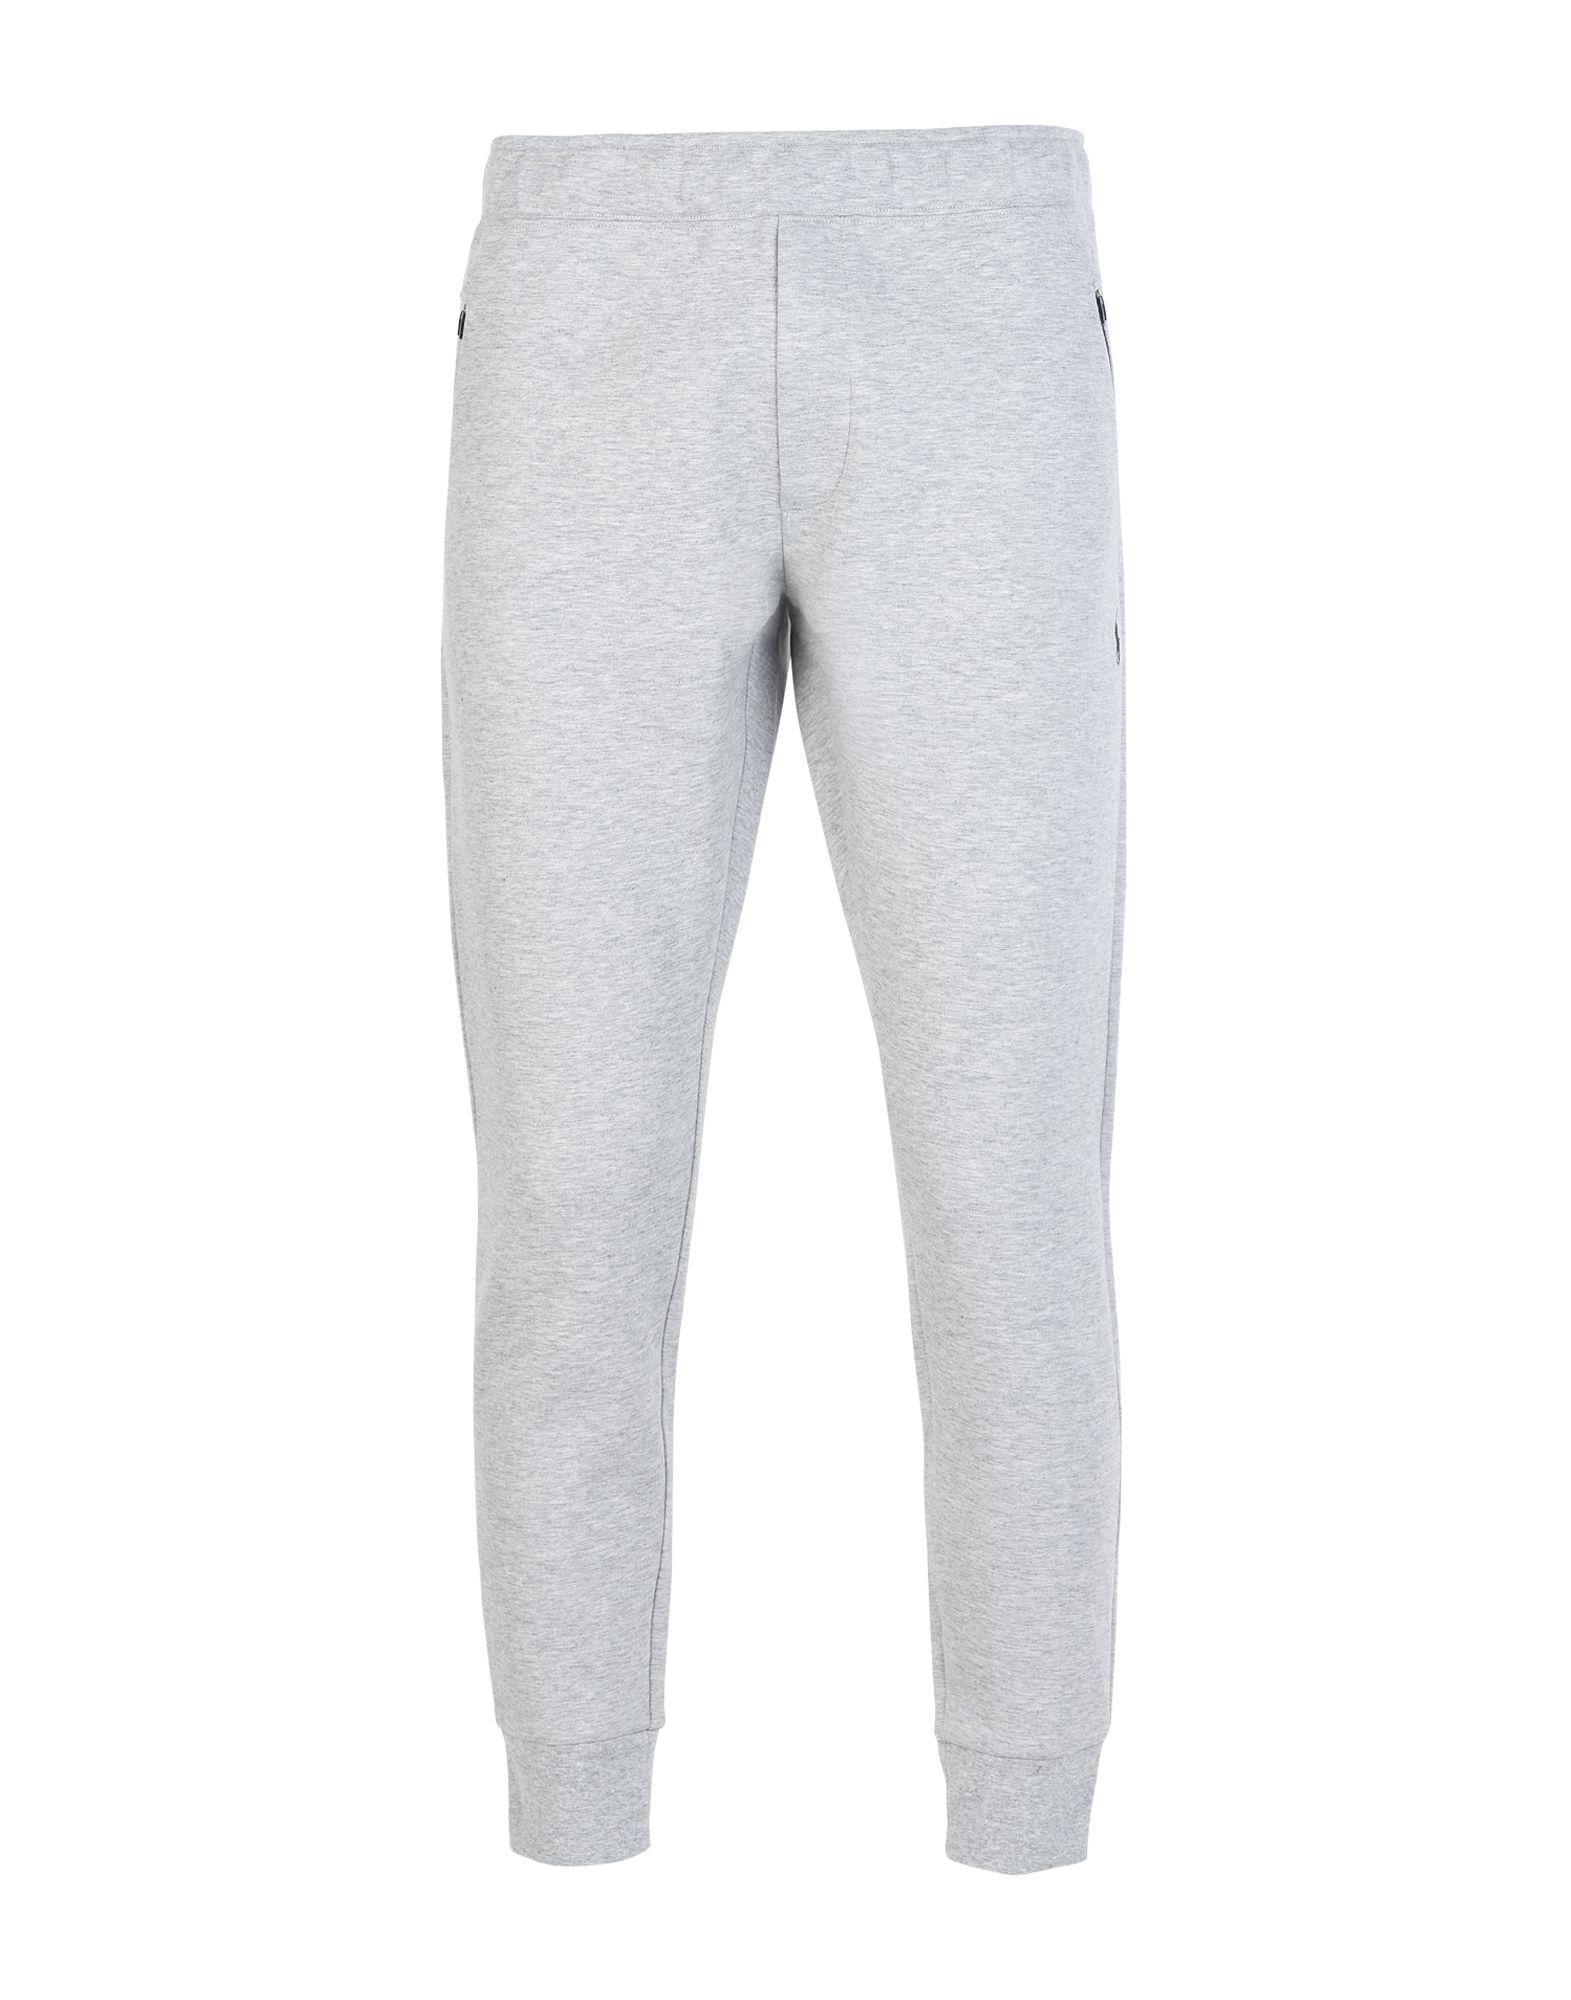 Pantalone Polo Ralph Lauren Double Knit Athletic Pant - Uomo - Acquista online su